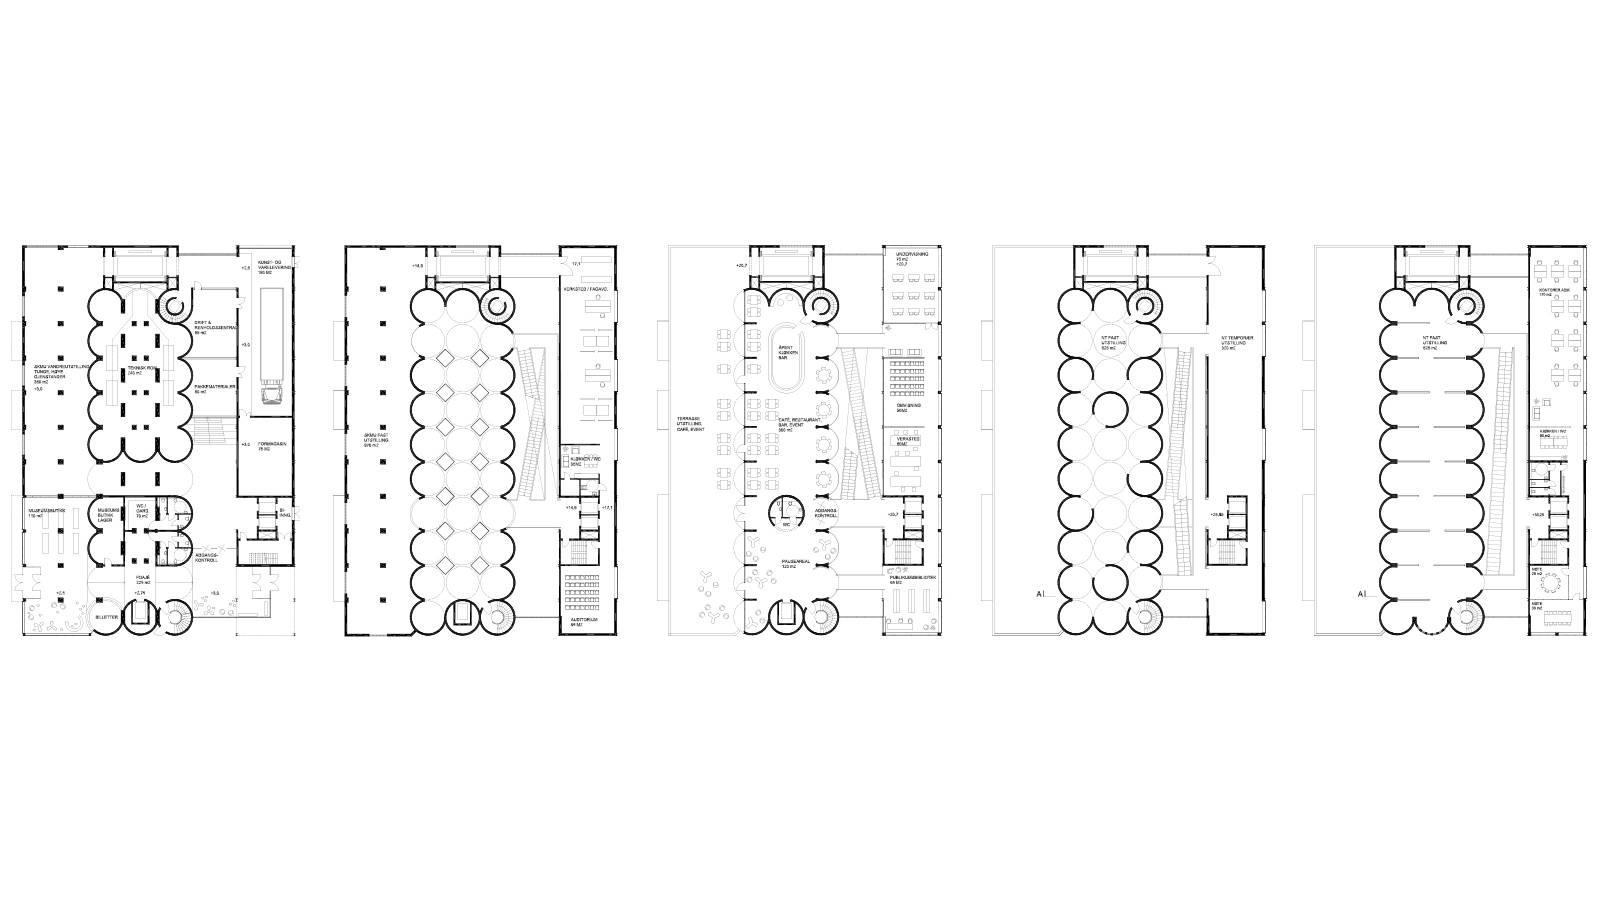 FLOOR PLAN 1, 2, 4, 5 AND 7 - Kunstsilo - SPOL Architects